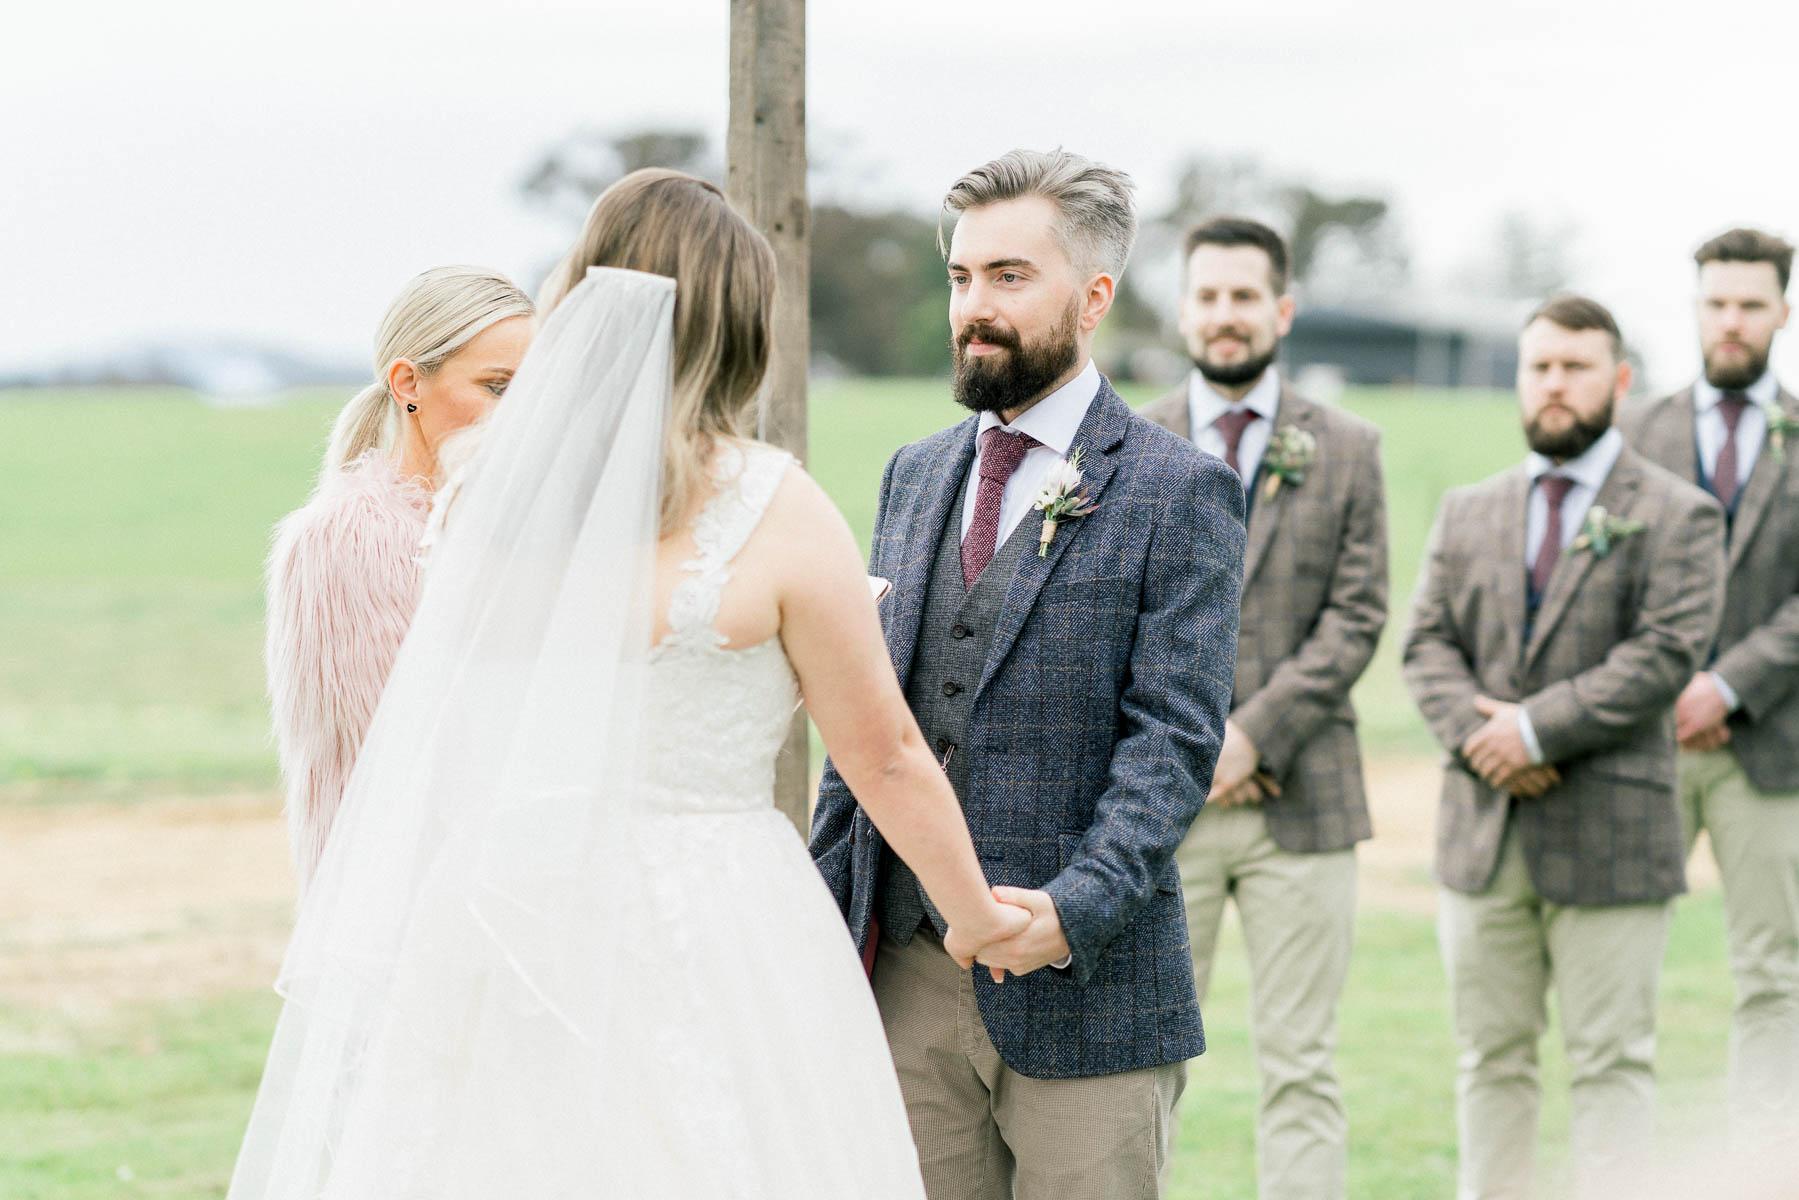 adams-farm-coldstream-yarra-valley-wedding-heart+soul-weddings-kel-jarryd-04942.jpg